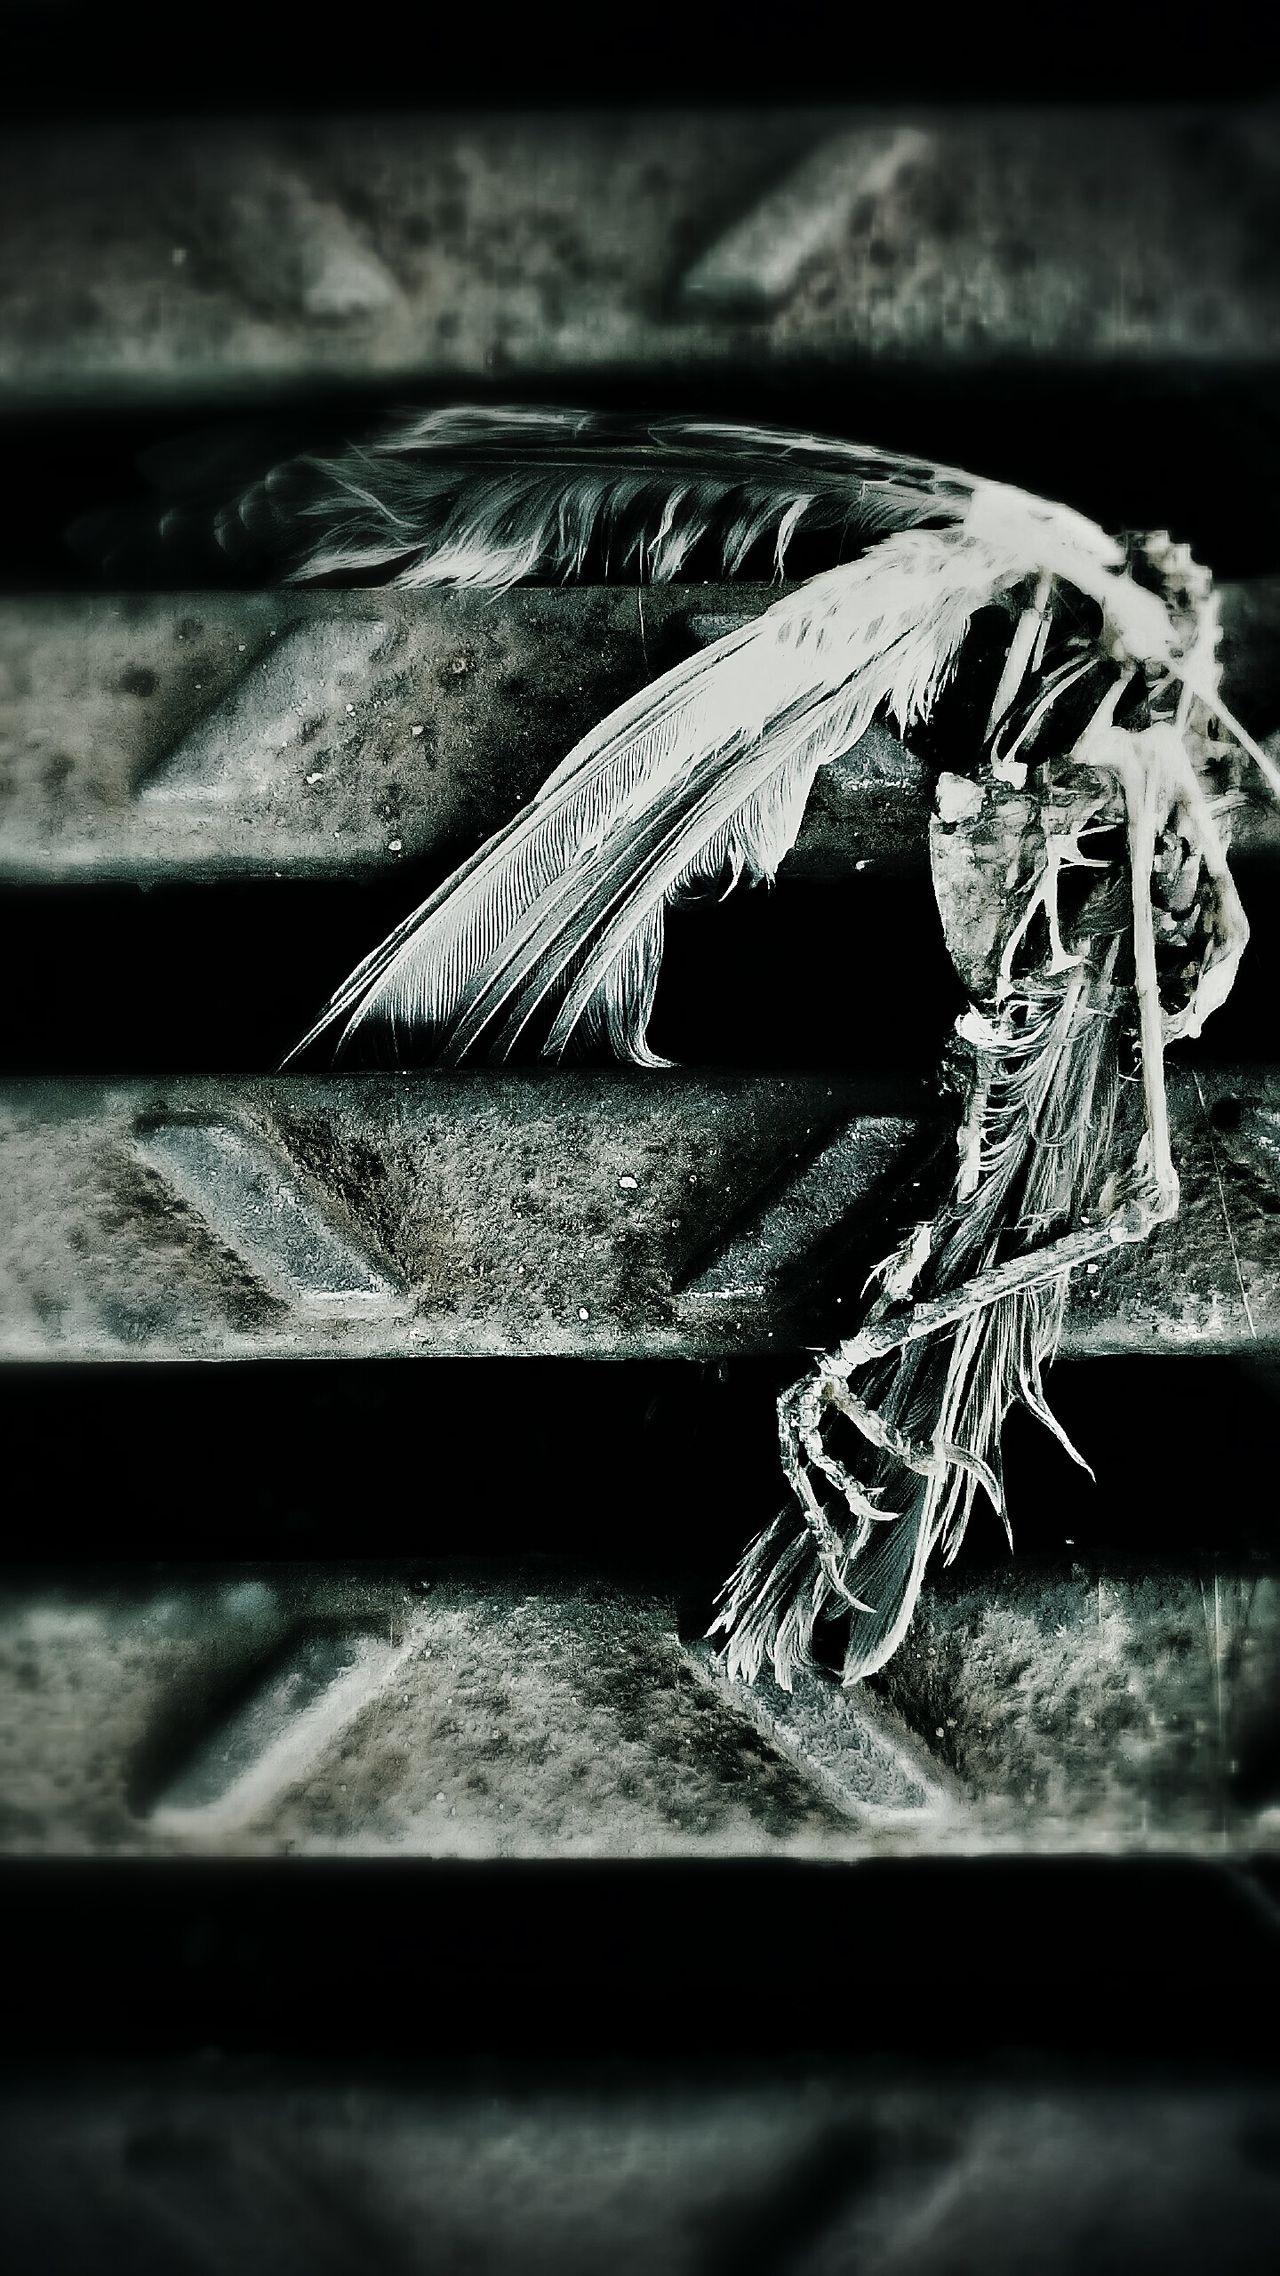 Angels Morte Anunciada Do Meio Ambiente Bird Bird Photography Birds Of EyeEm  Nature_collection Nature Indios Passarosferidos Poluição Ambient Asas Ossos Black White Blackandwhite Black And White Vscogood Vscogrid Vscodaily VSCO Photoart Vscogram Cam Photobirds